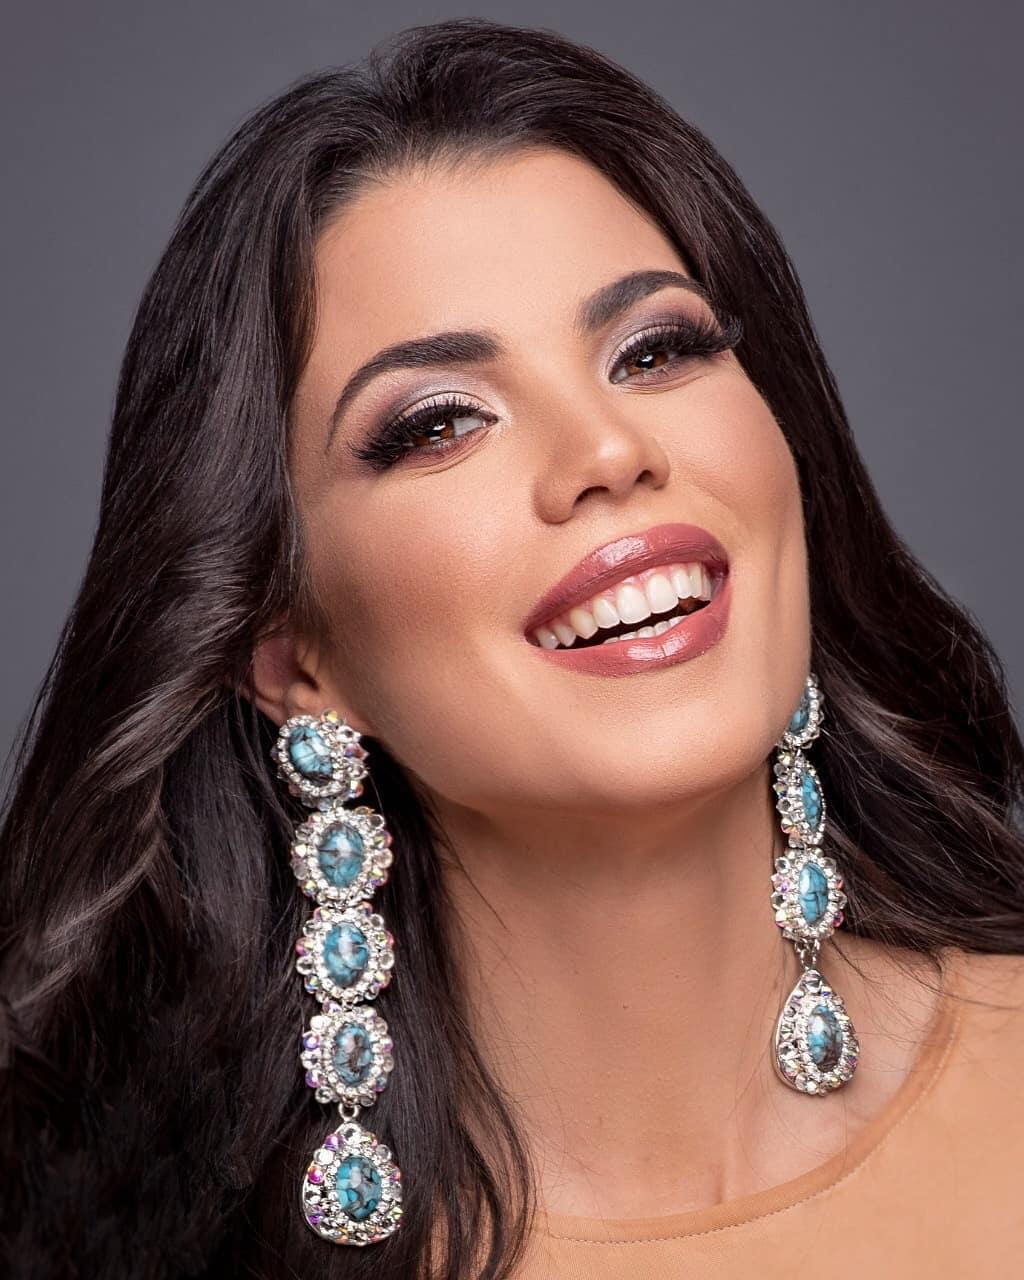 candidatas a miss chile universo 2018. final: 19 agosto. - Página 9 Lqi4j2o5